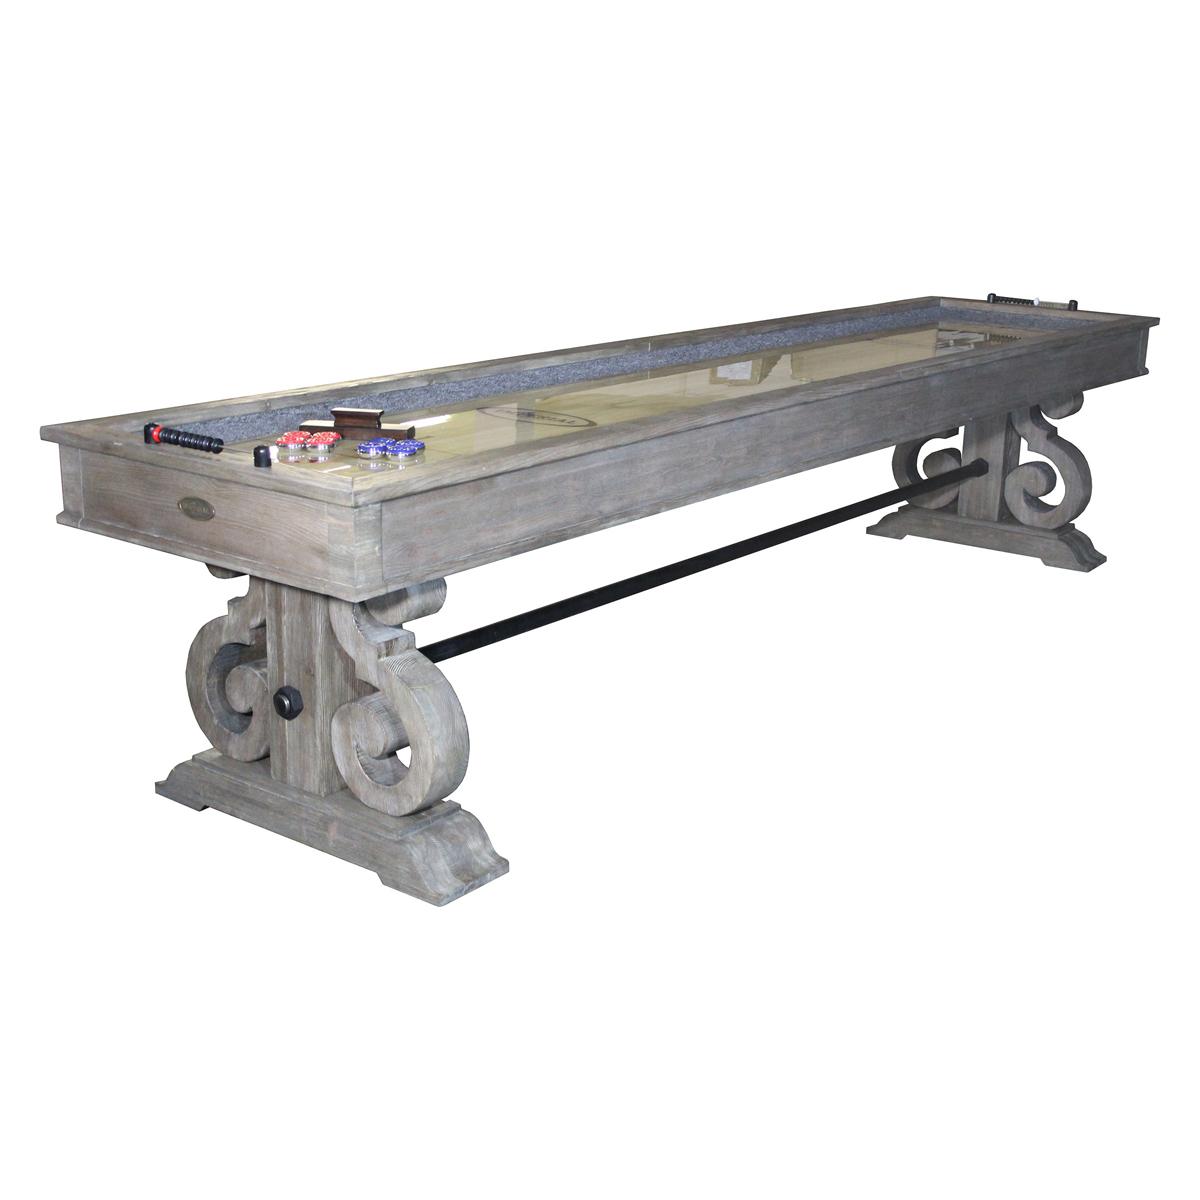 12-ft. shuffleboard table